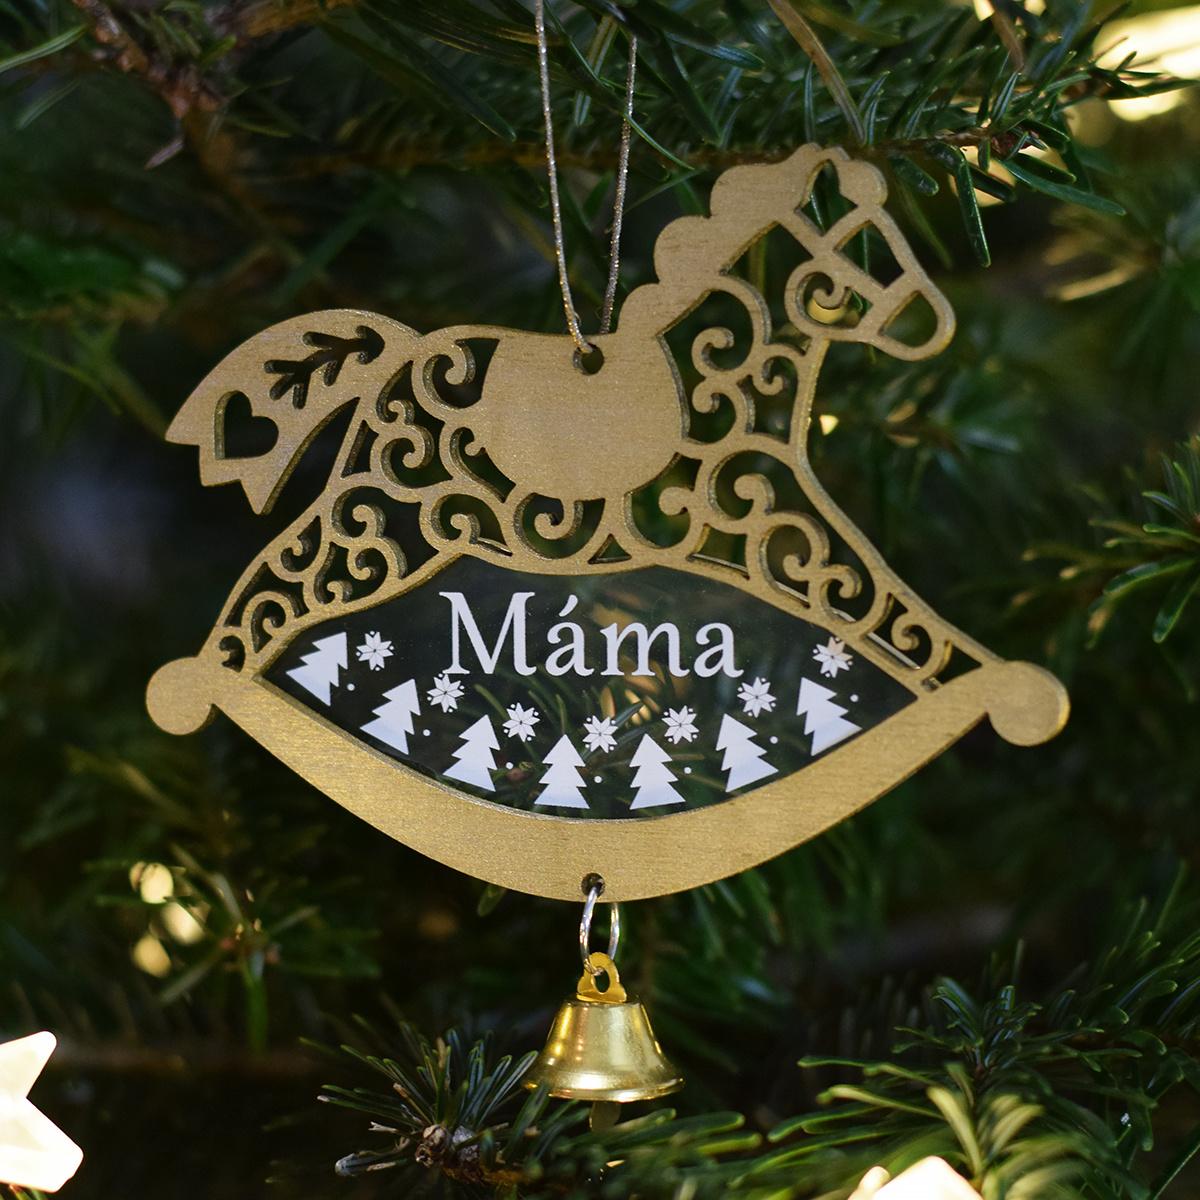 HOUSEDECOR Zlatý koník se zvonečkem - Máma